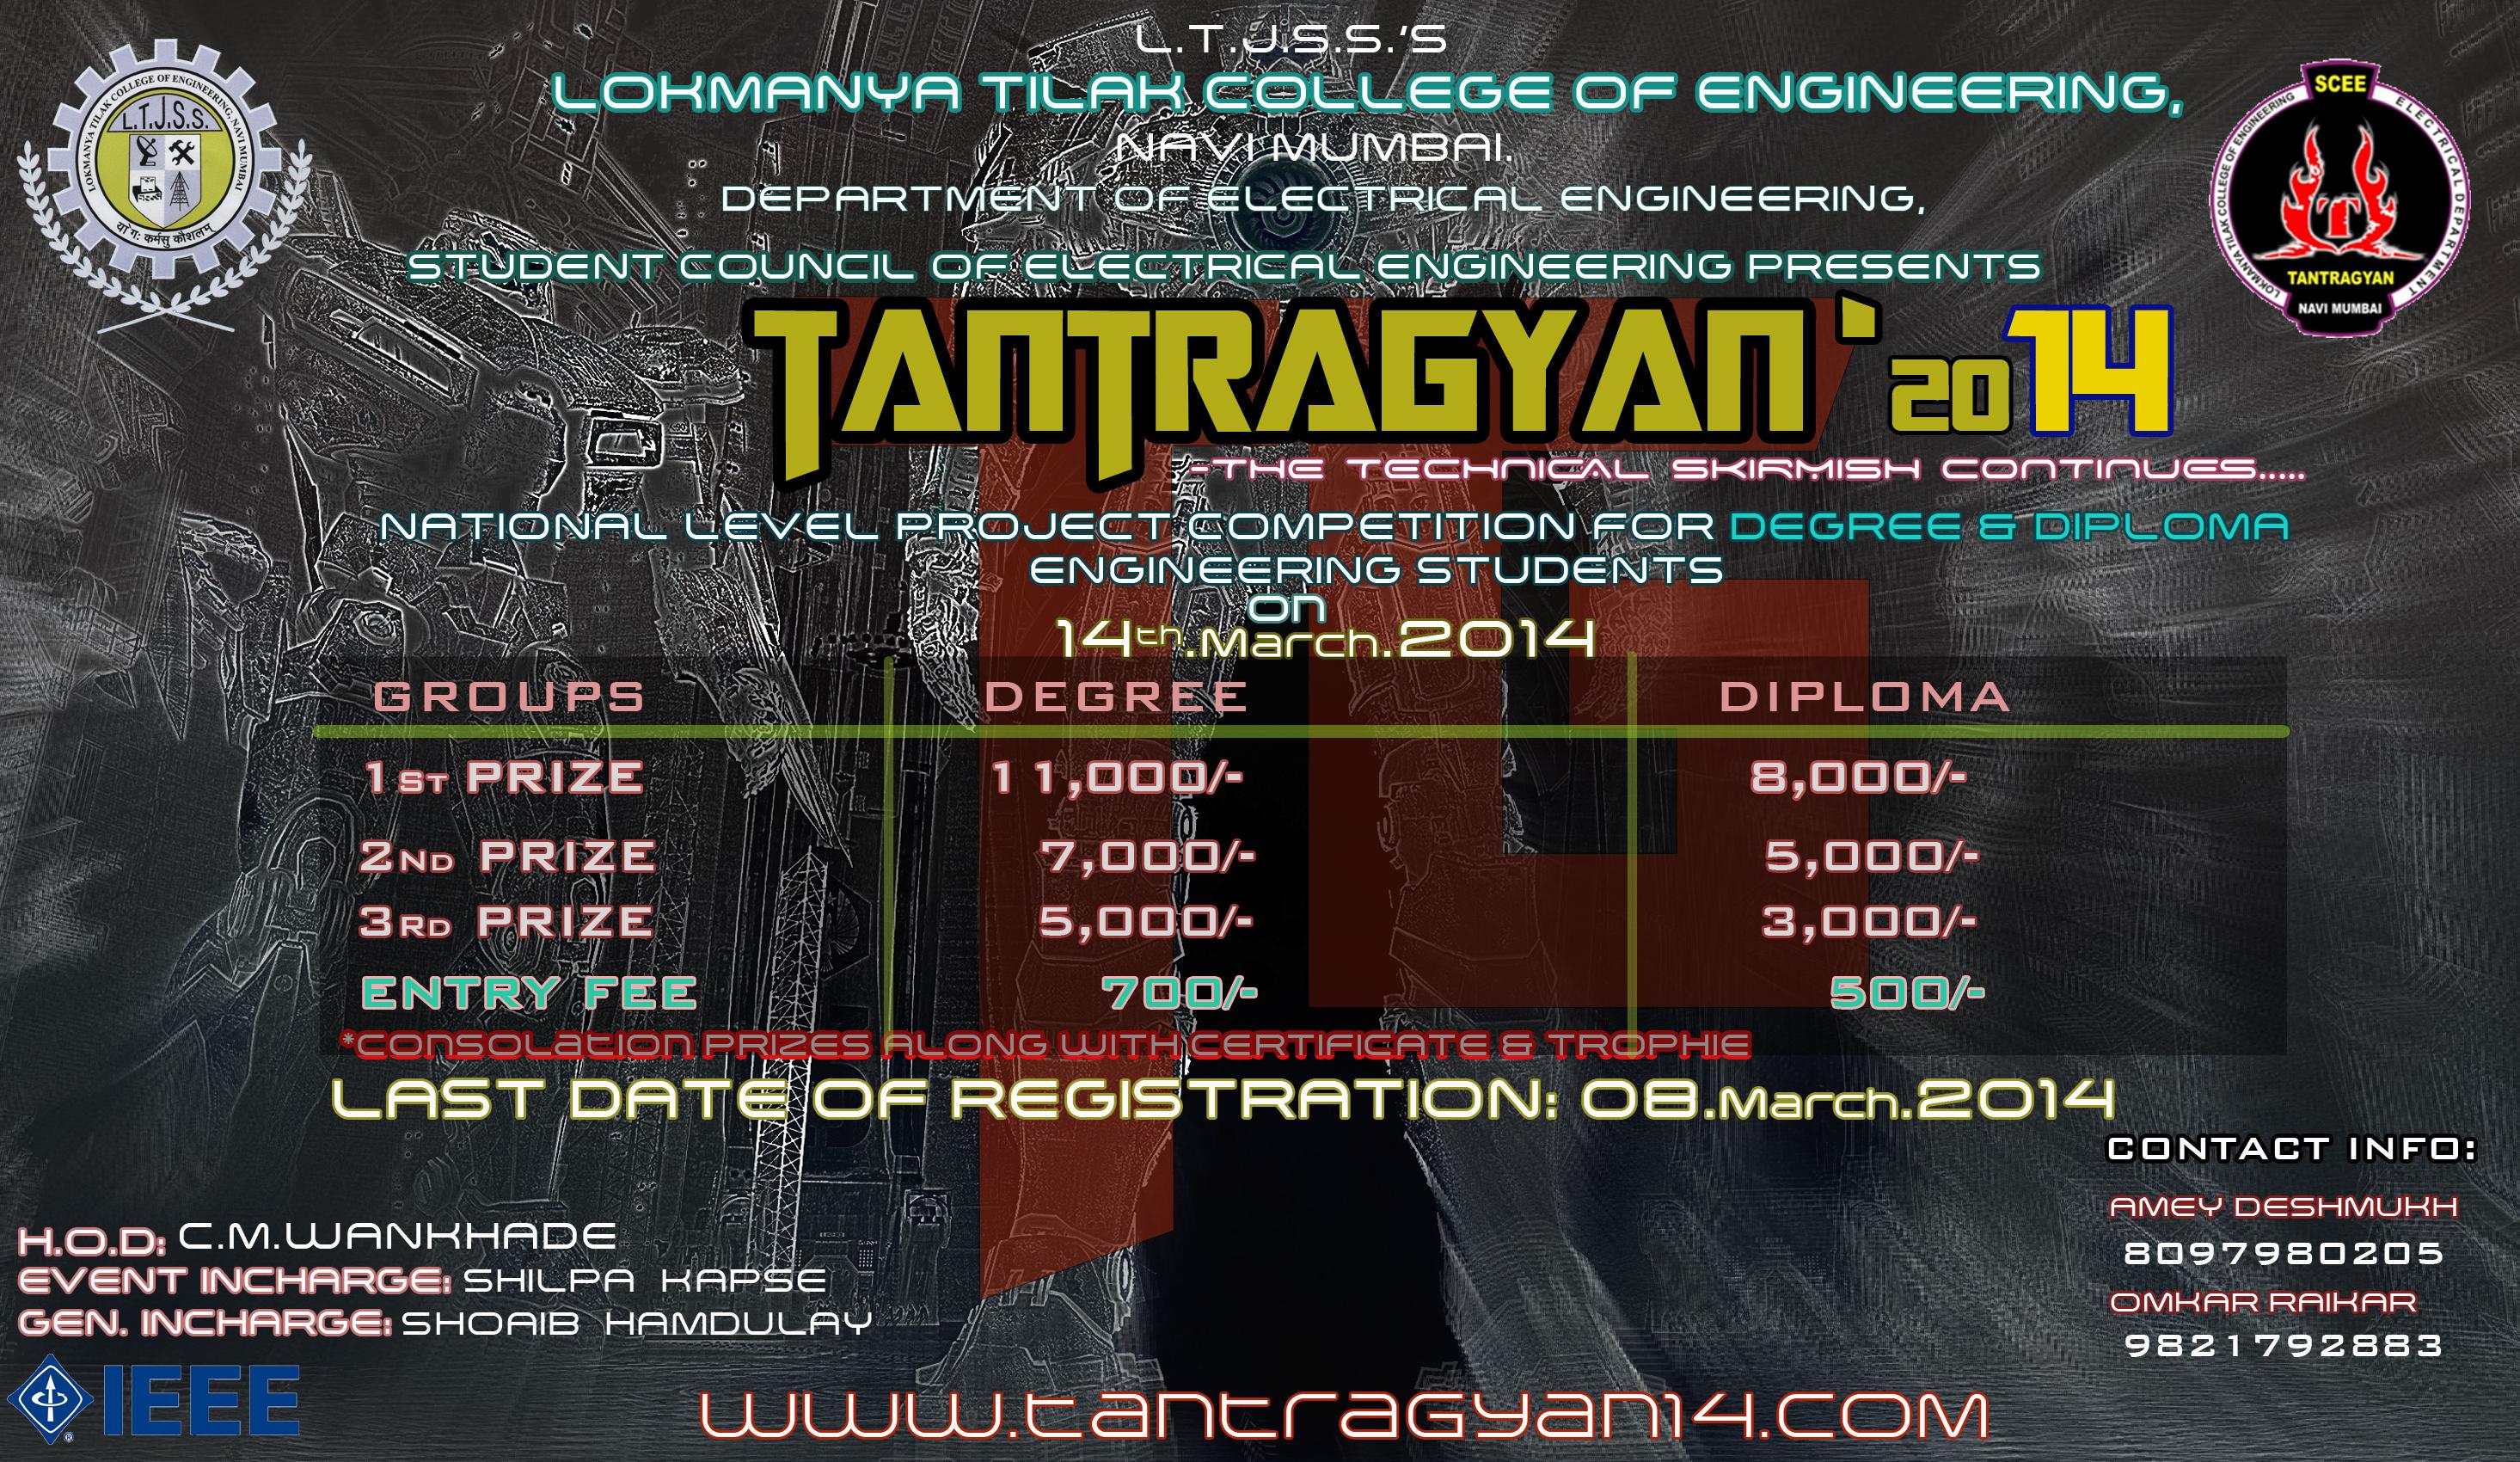 Tantragyan 2014